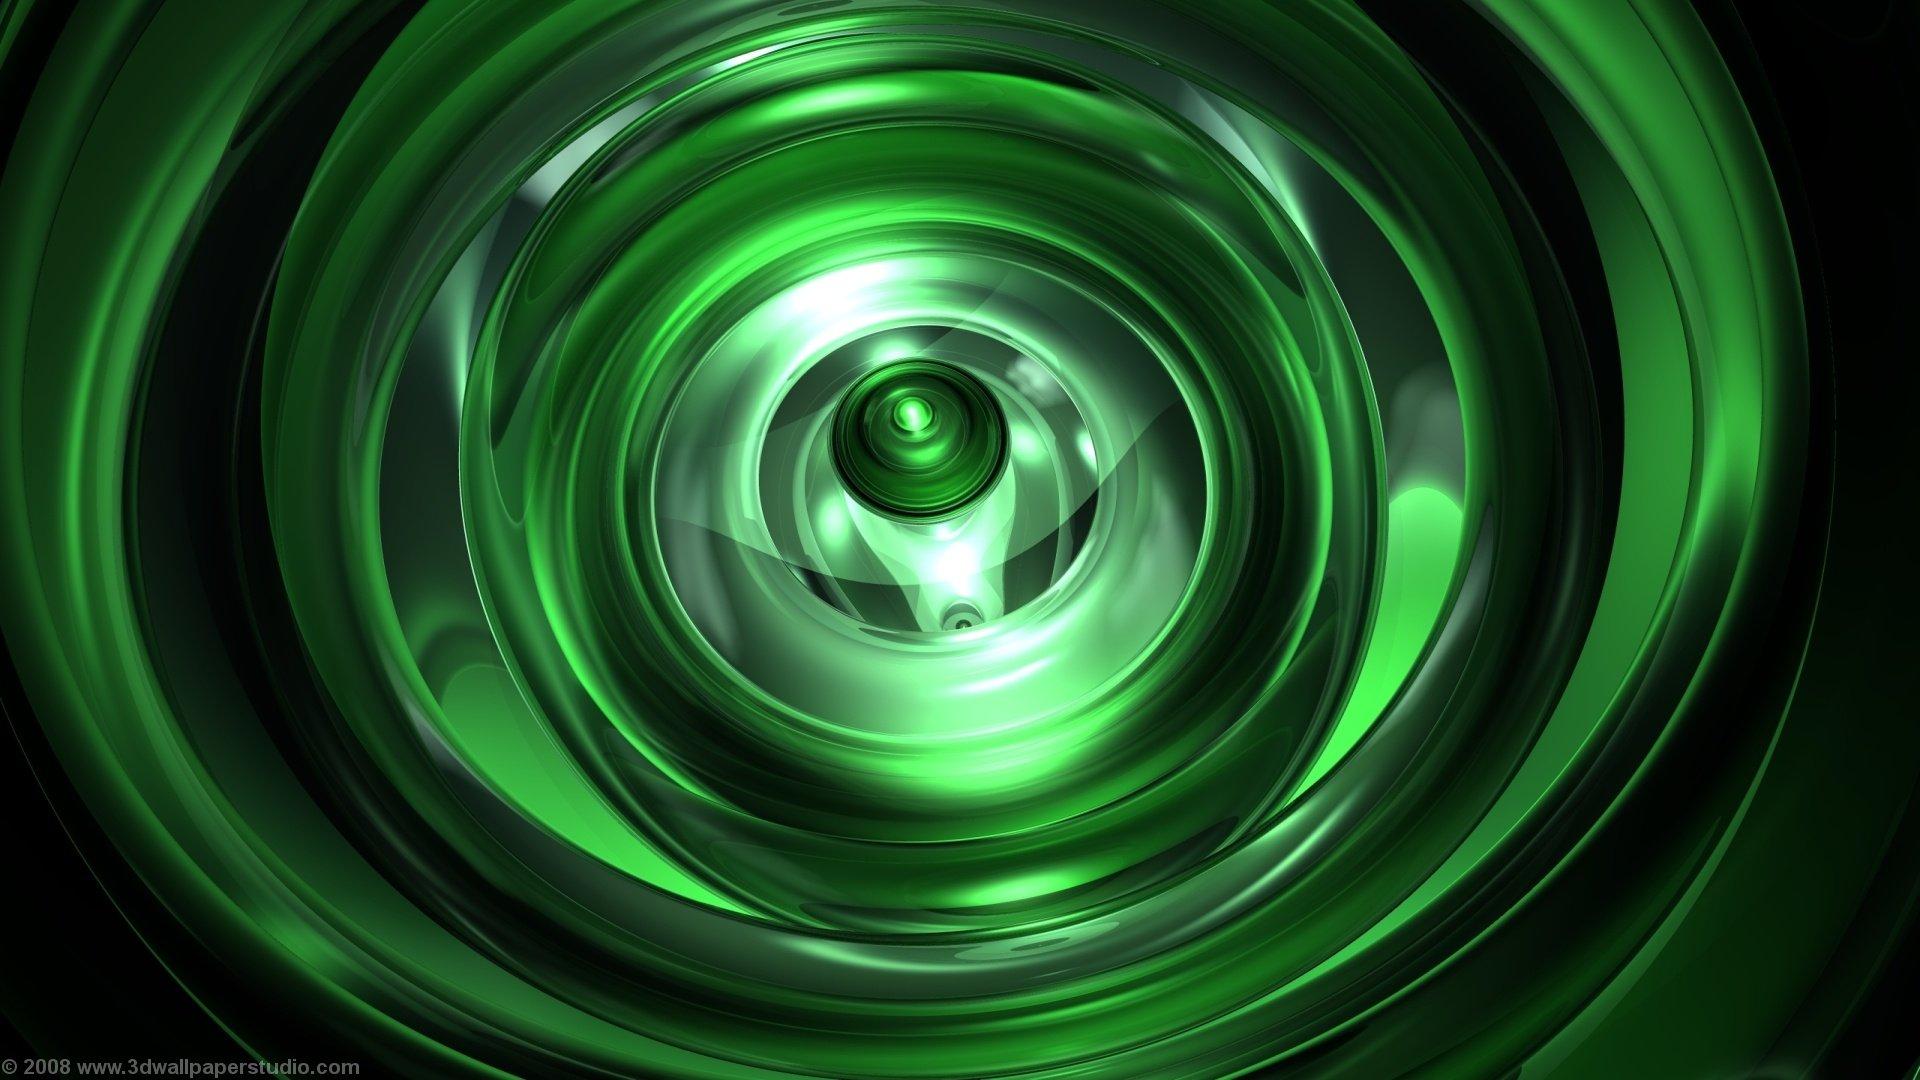 green vortex wallpaper linux wallpapers 1920x1080 1920x1080